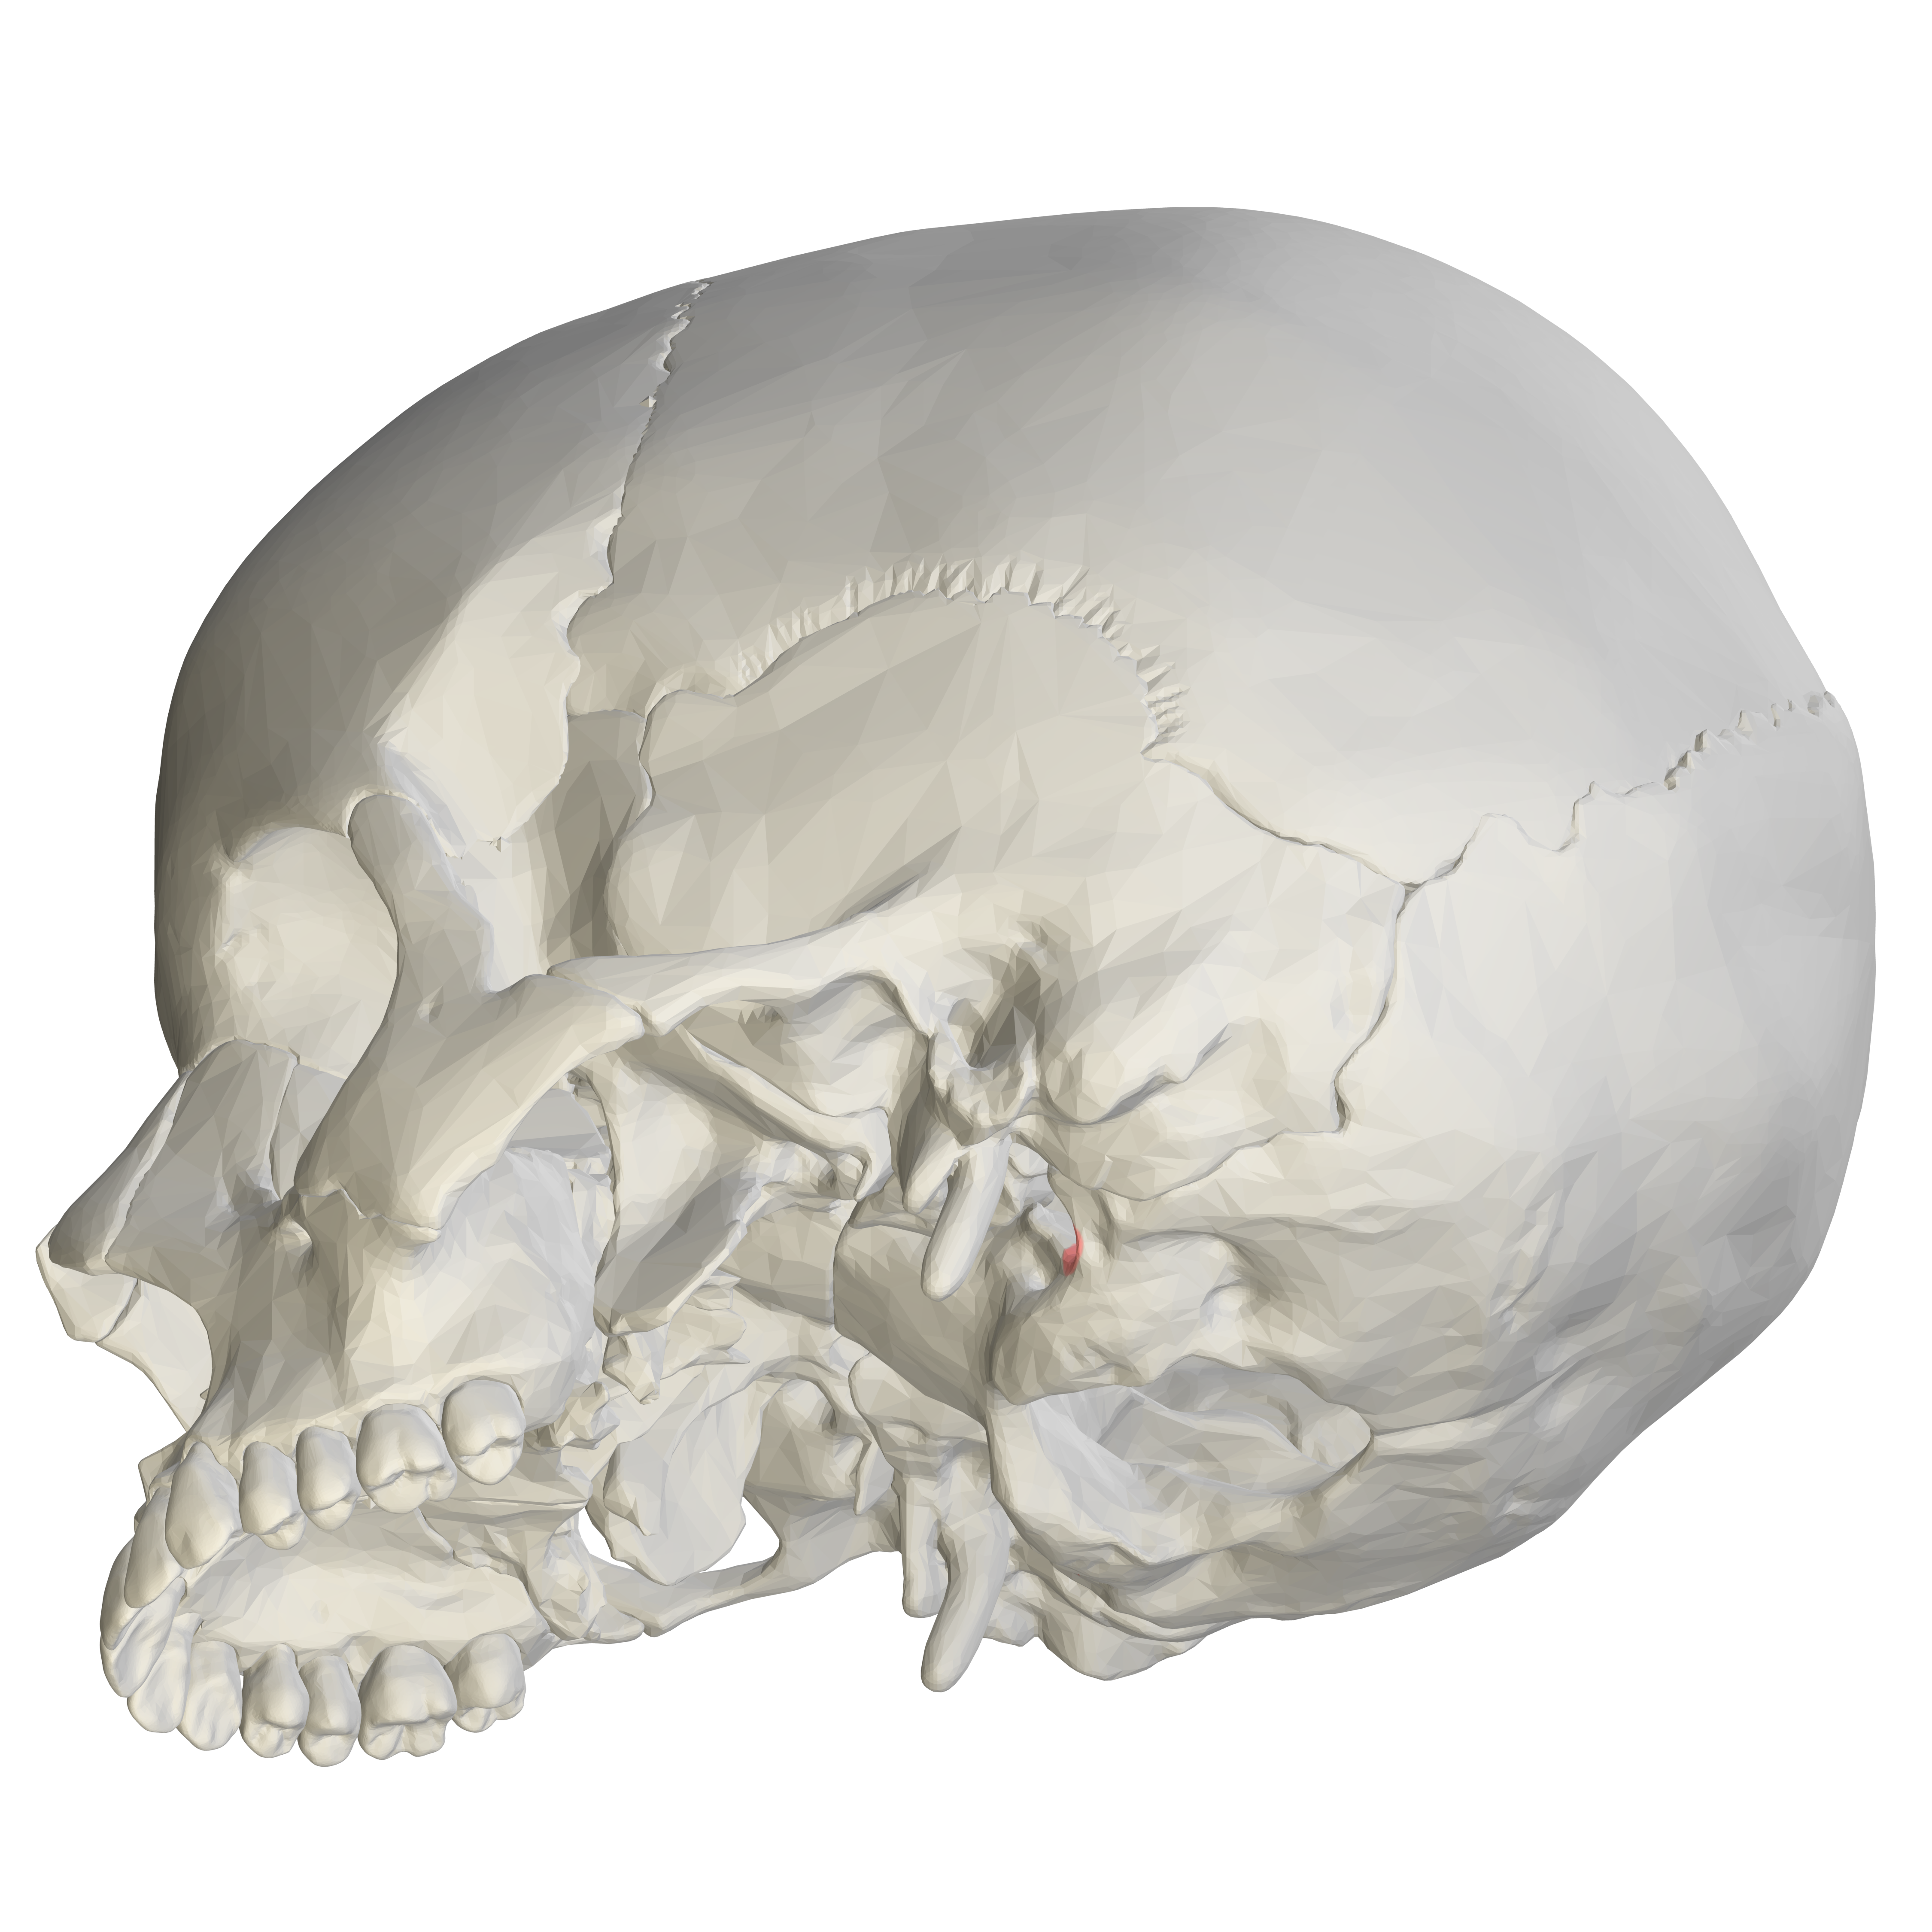 Jugular Notch Occipital Bone File:Jugular not...